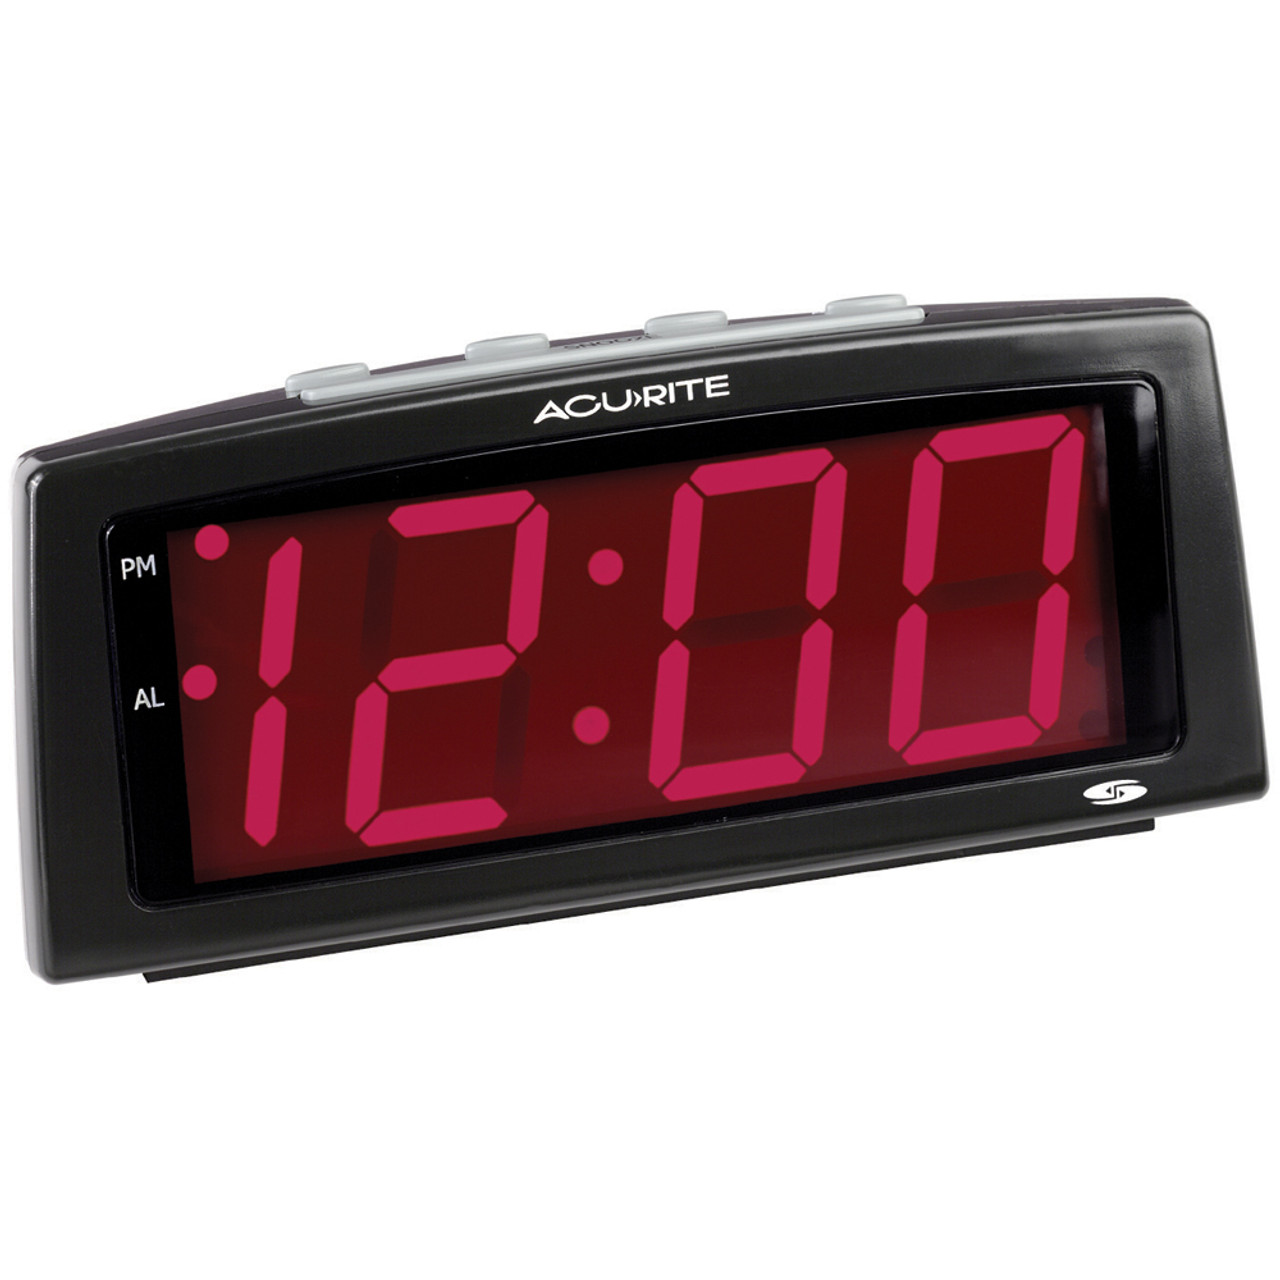 2 inch Red Digits LED Alarm Clock